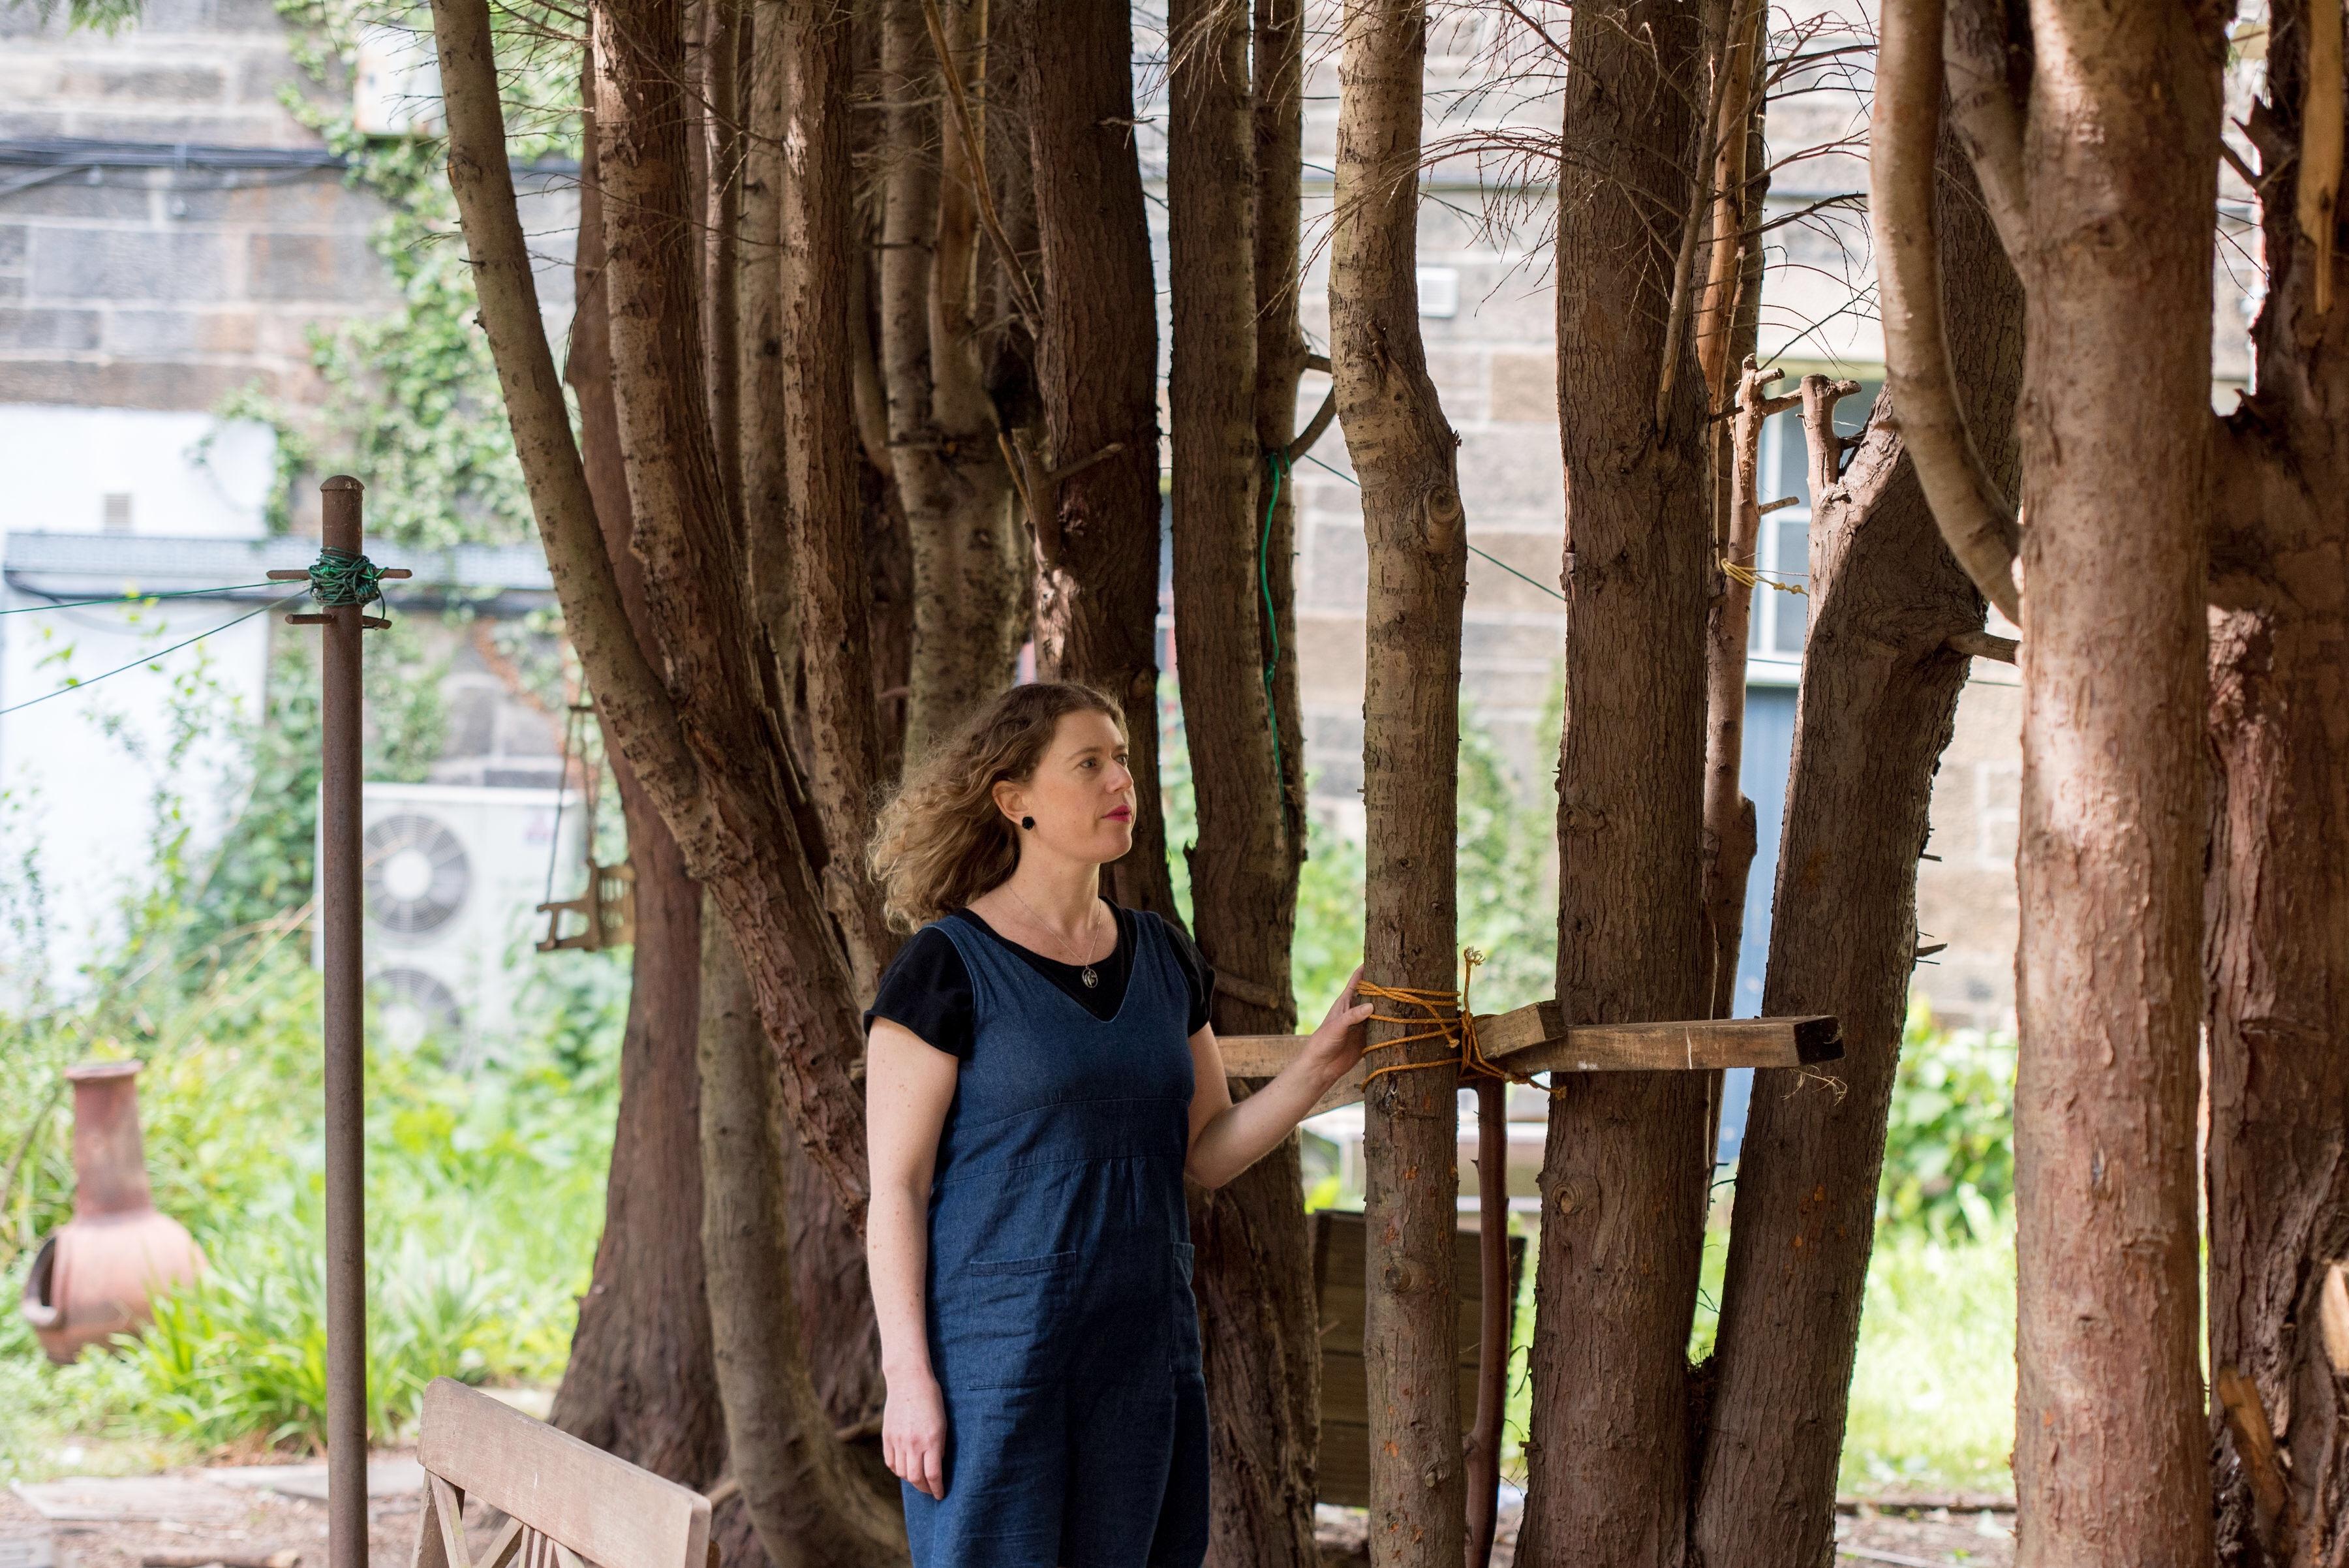 Woman stands in urban garden